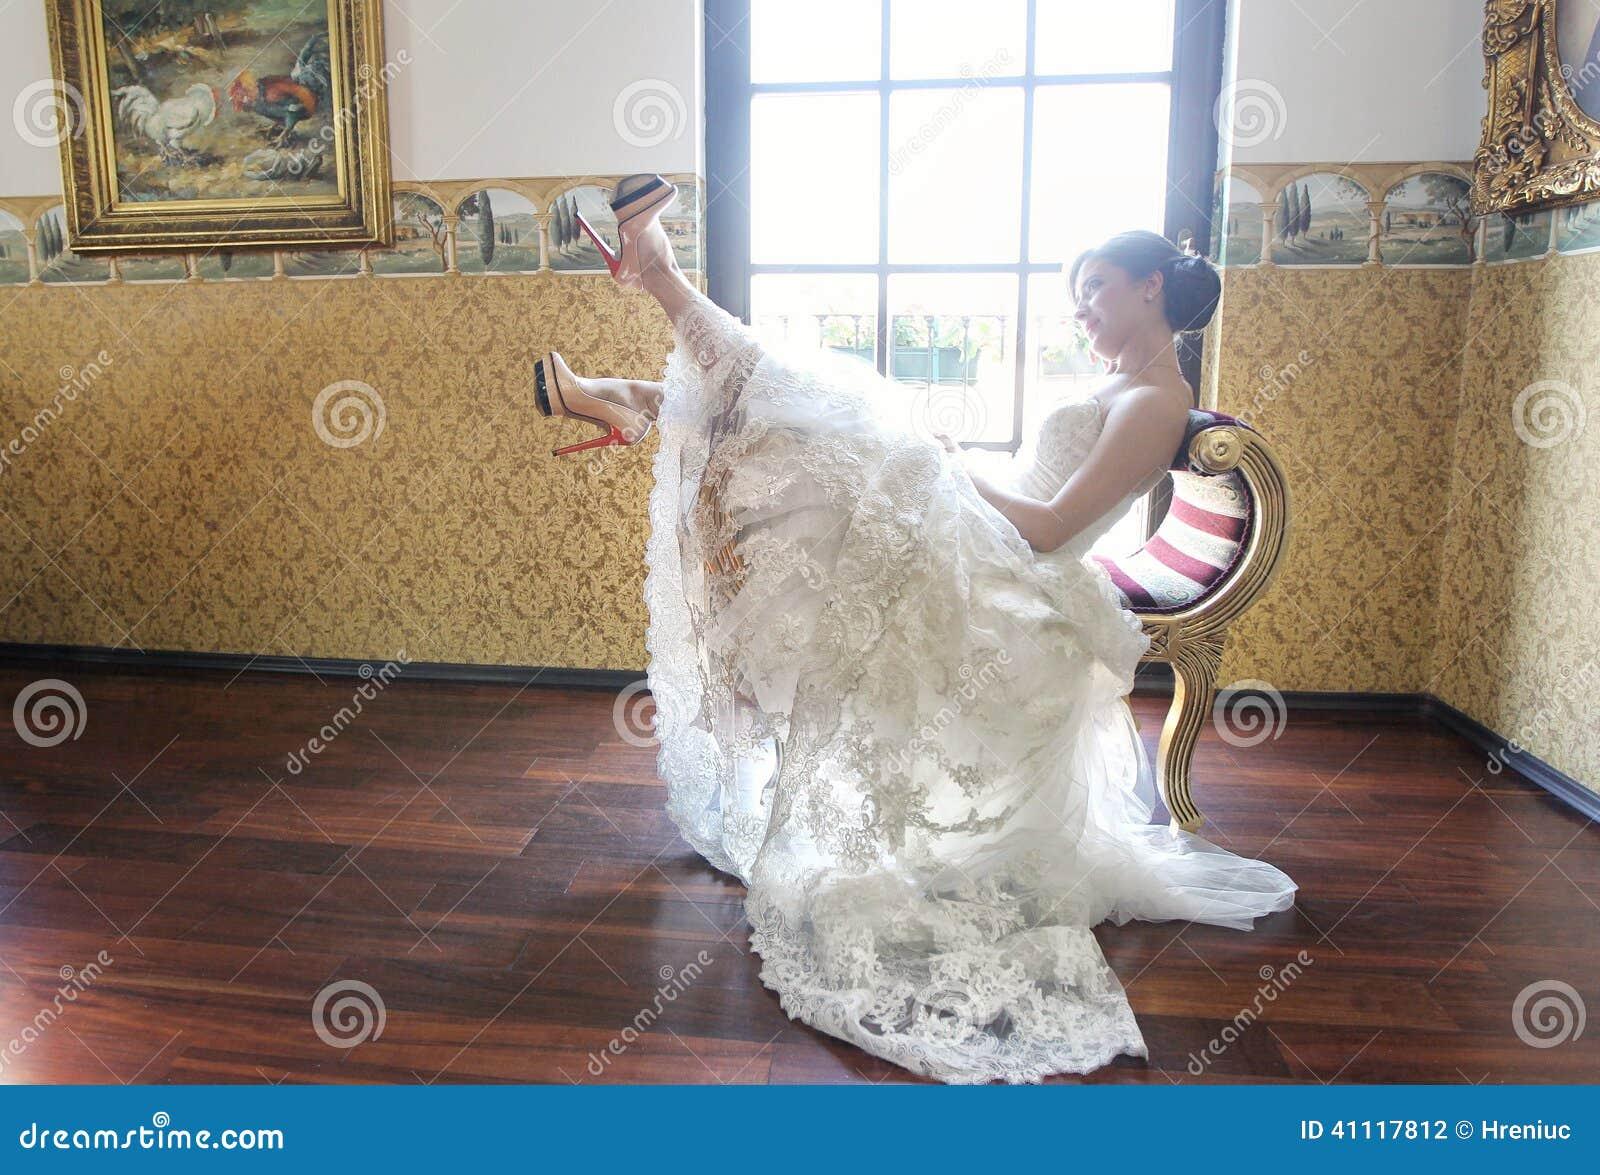 Bride in her wedding day feeling great